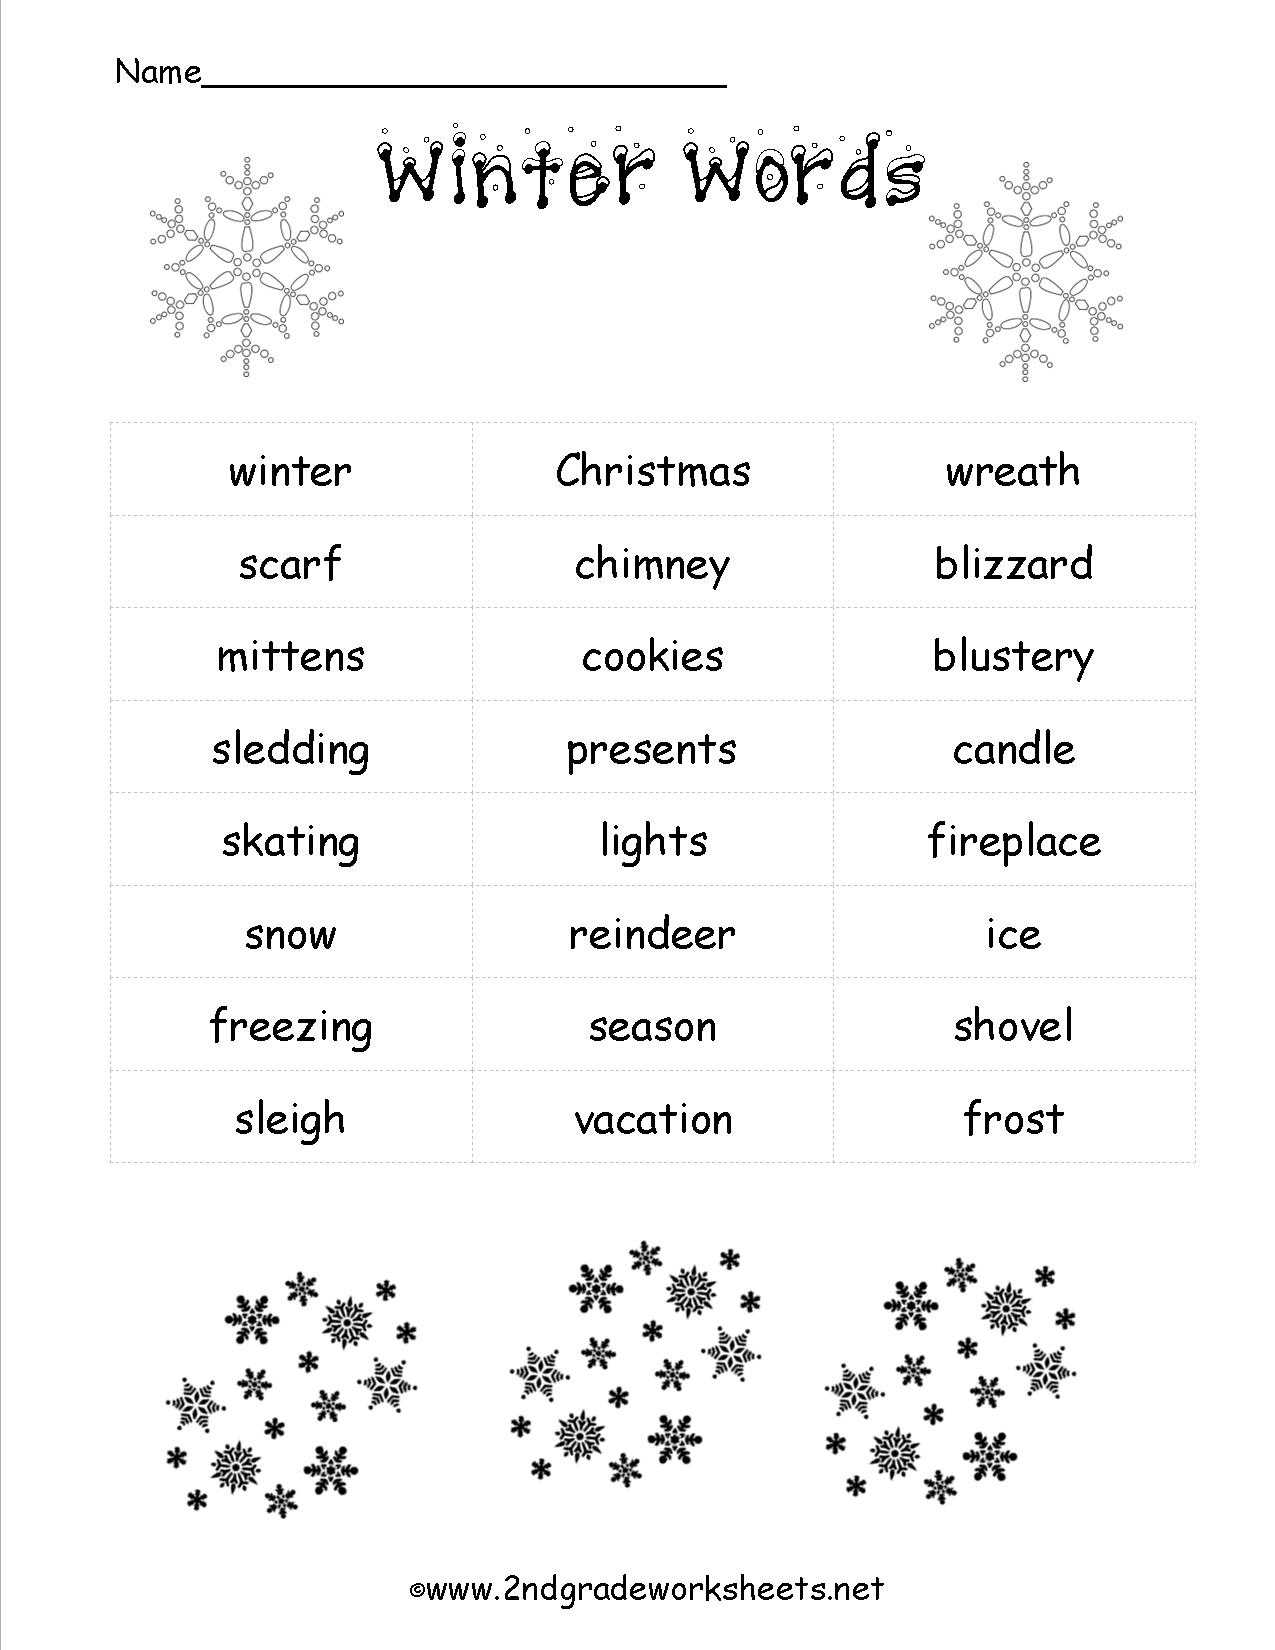 Christmas Worksheets And Printouts Free Winterwordlist